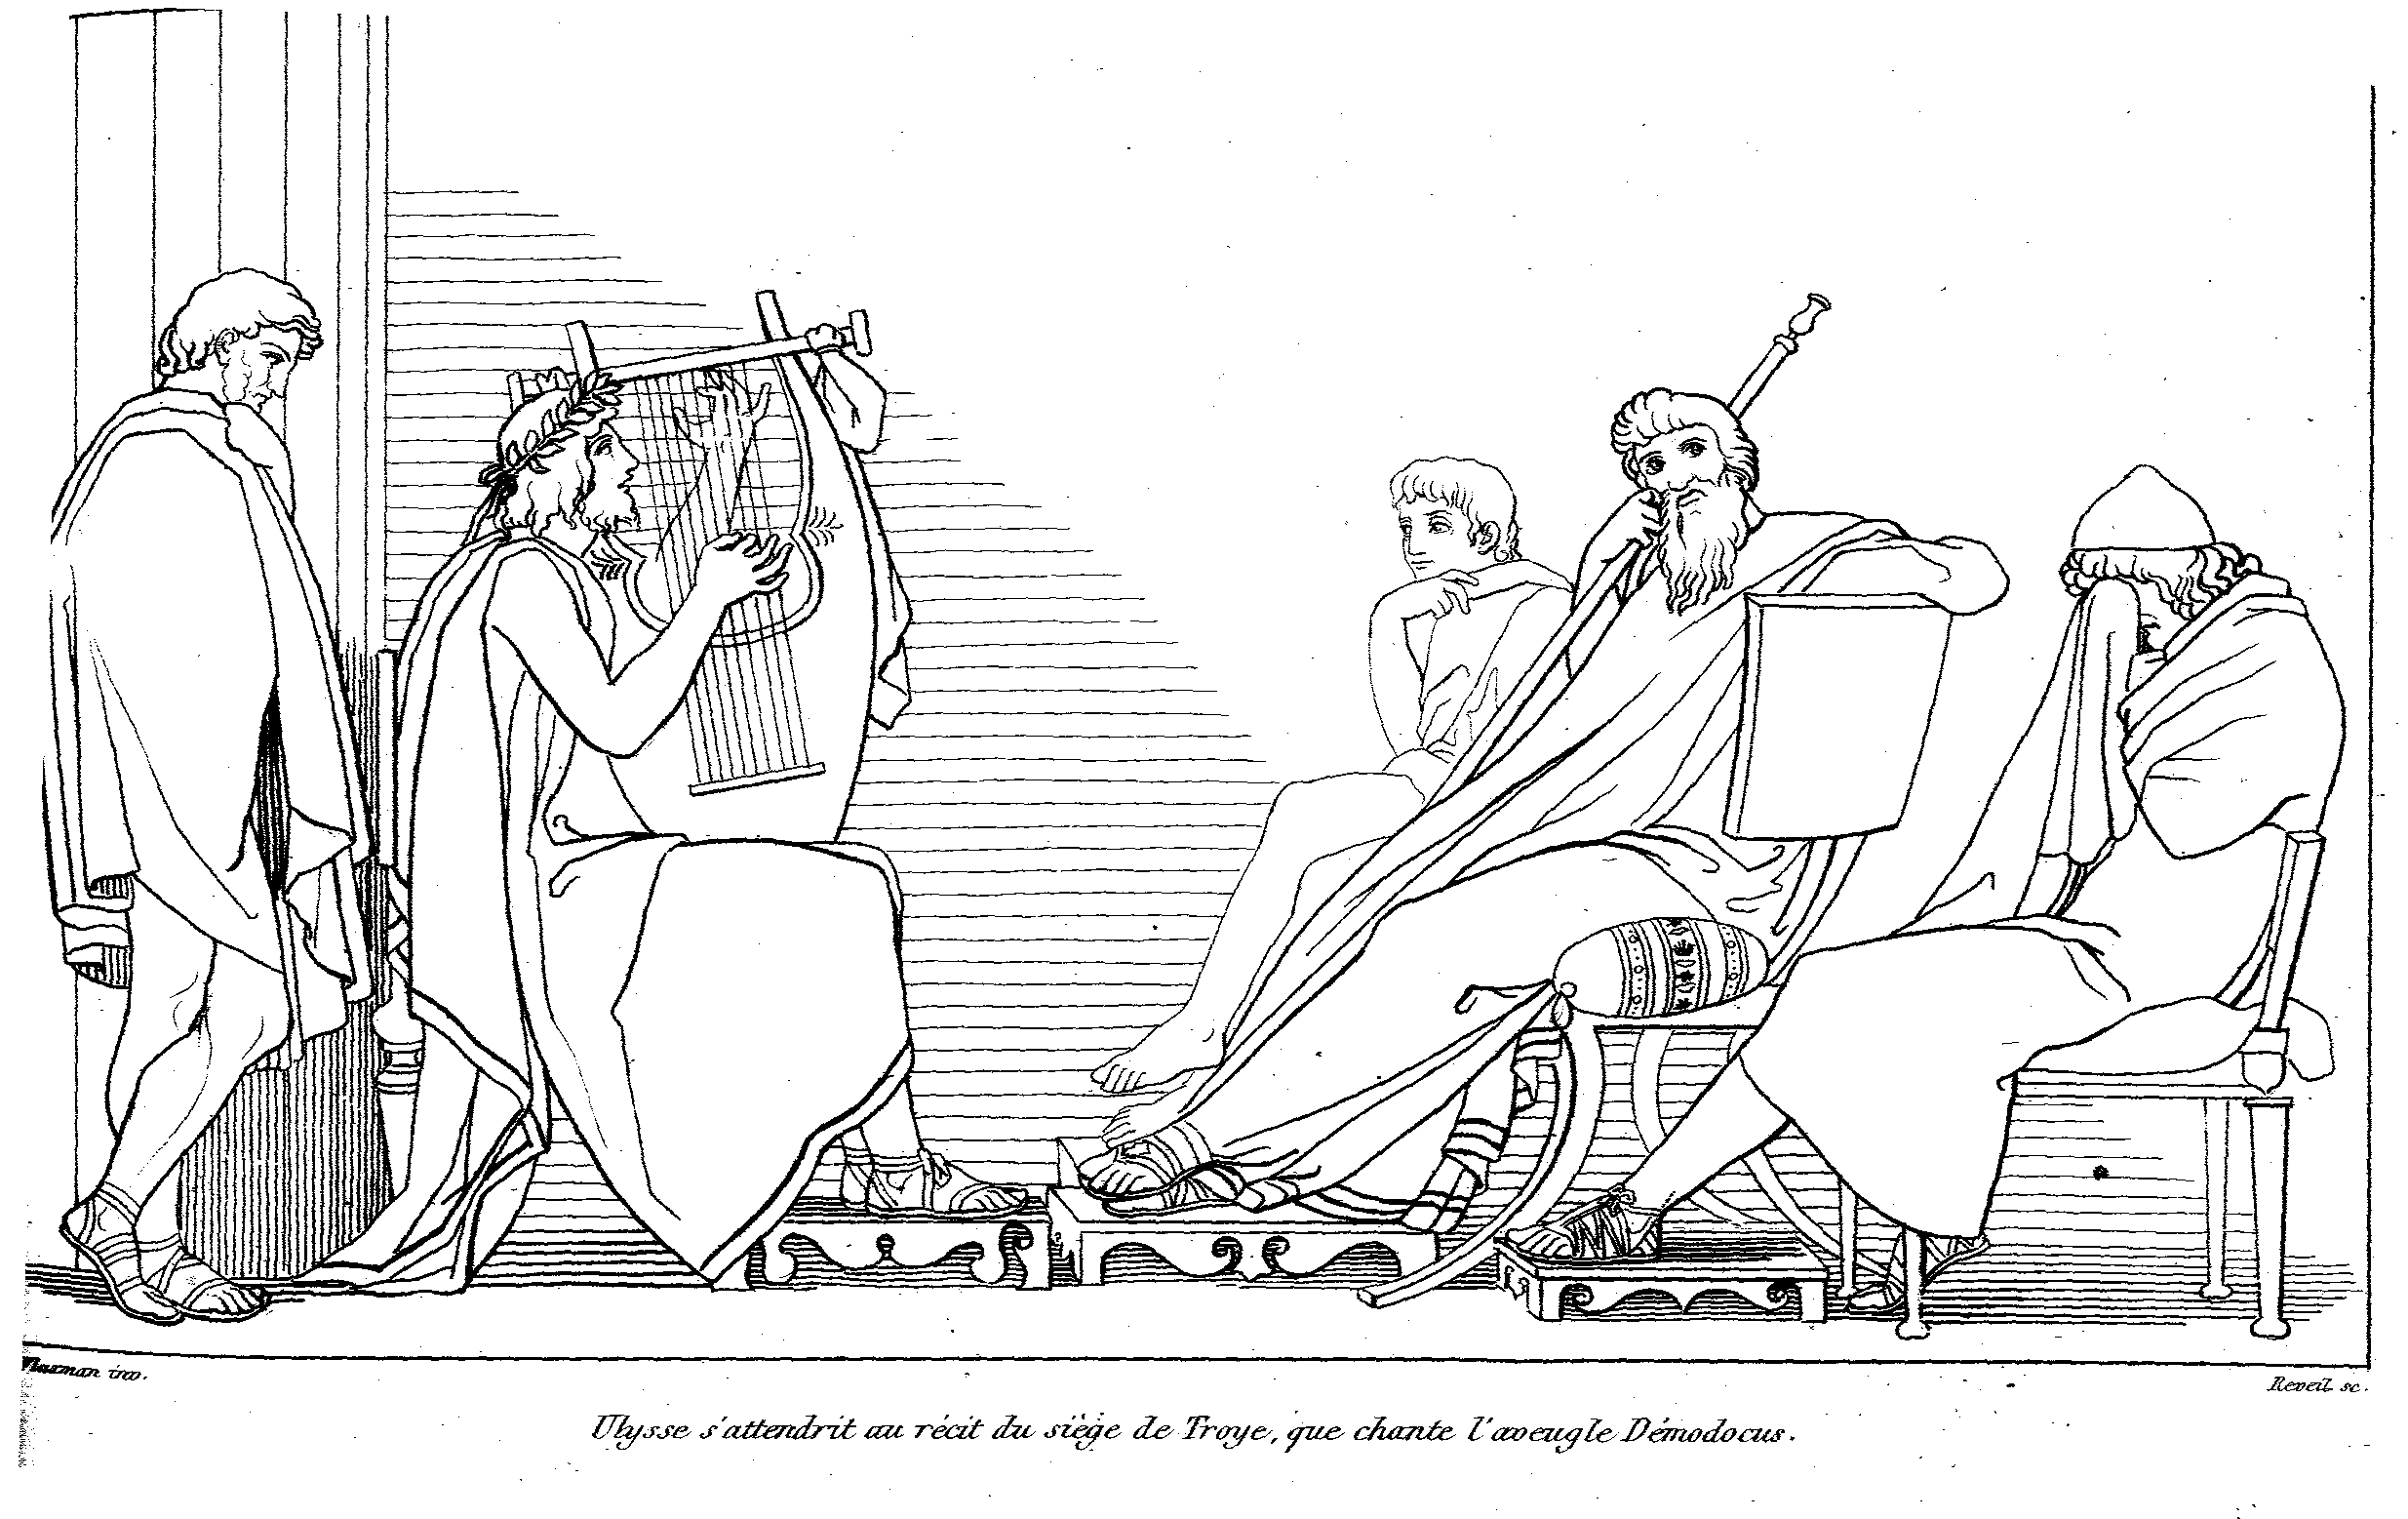 http://upload.wikimedia.org/wikipedia/commons/c/cb/OdysseyDemodokos.png